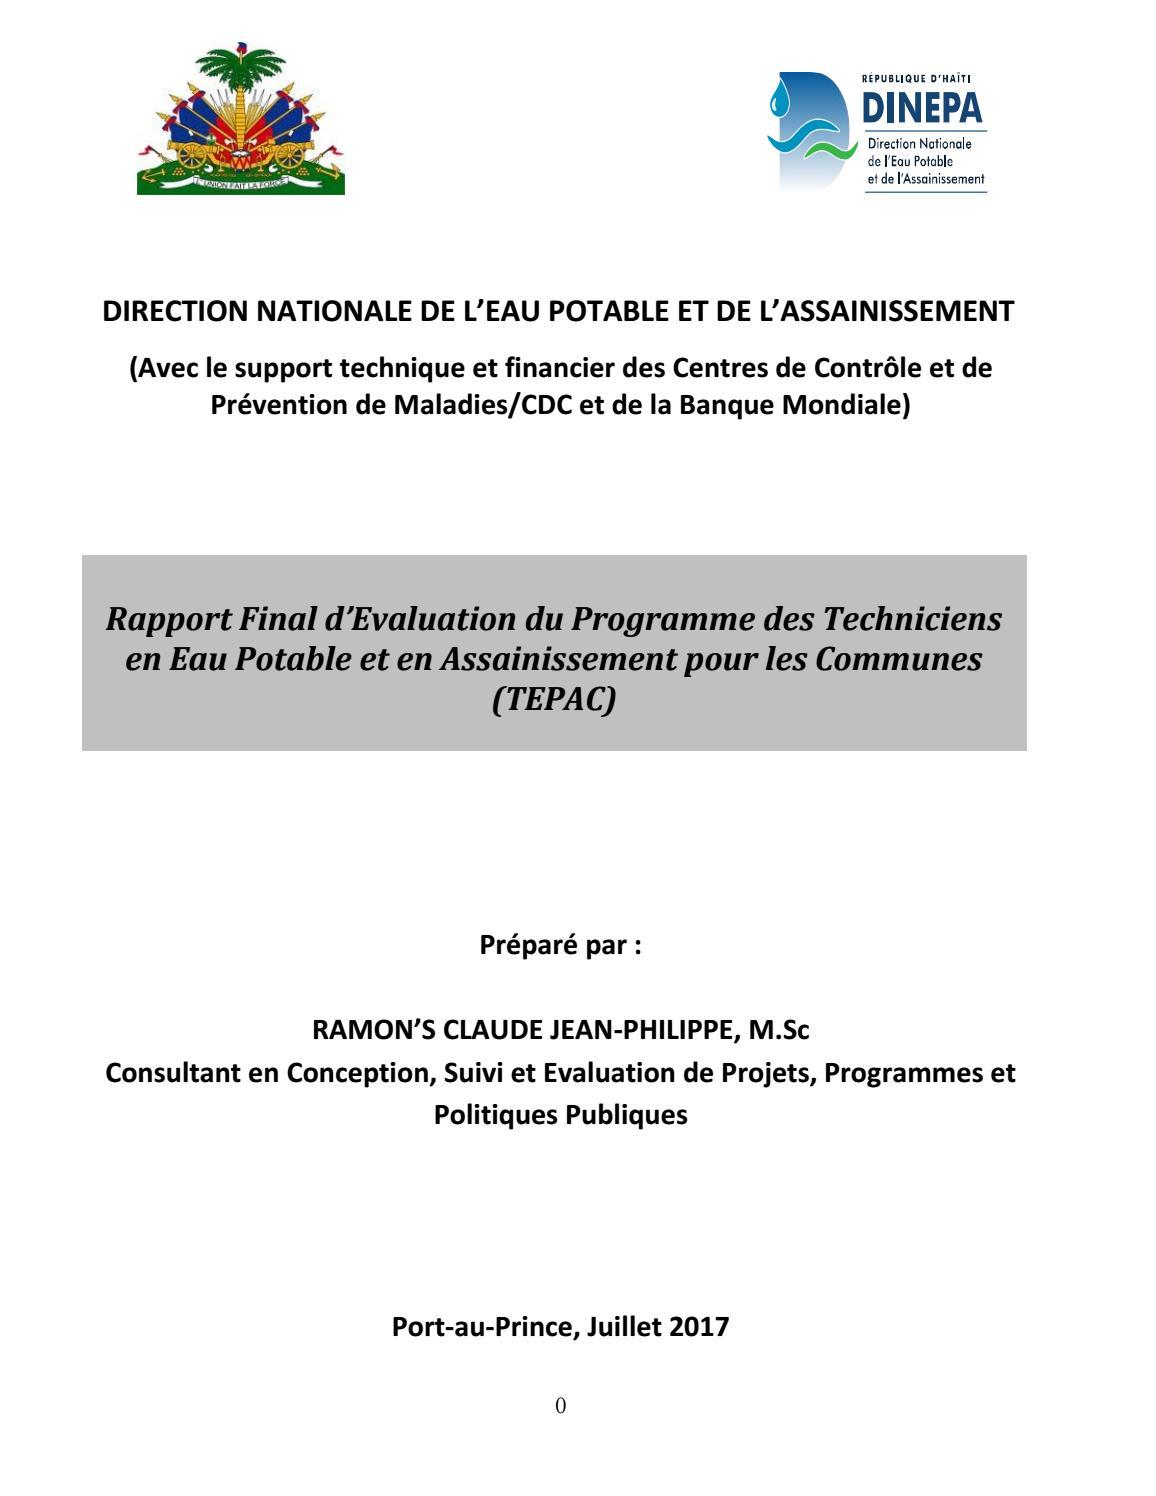 Rapport final d 39 evaluation du prog tepac by dinepa issuu - Office internationale de l eau ...